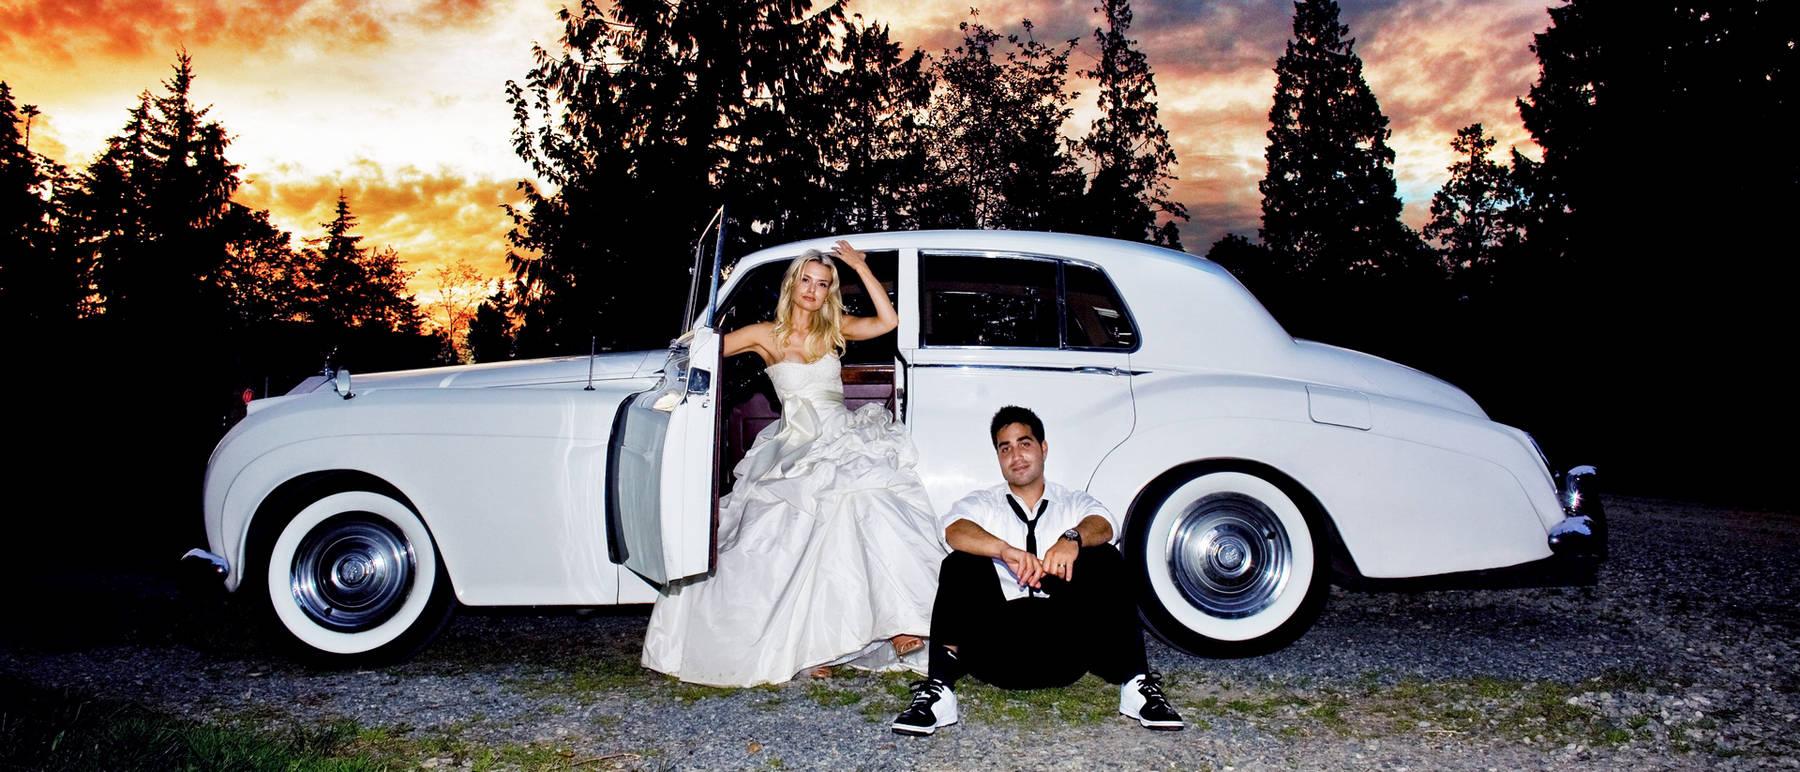 johnandjoseph-wedding-photographer-hz-slider-313